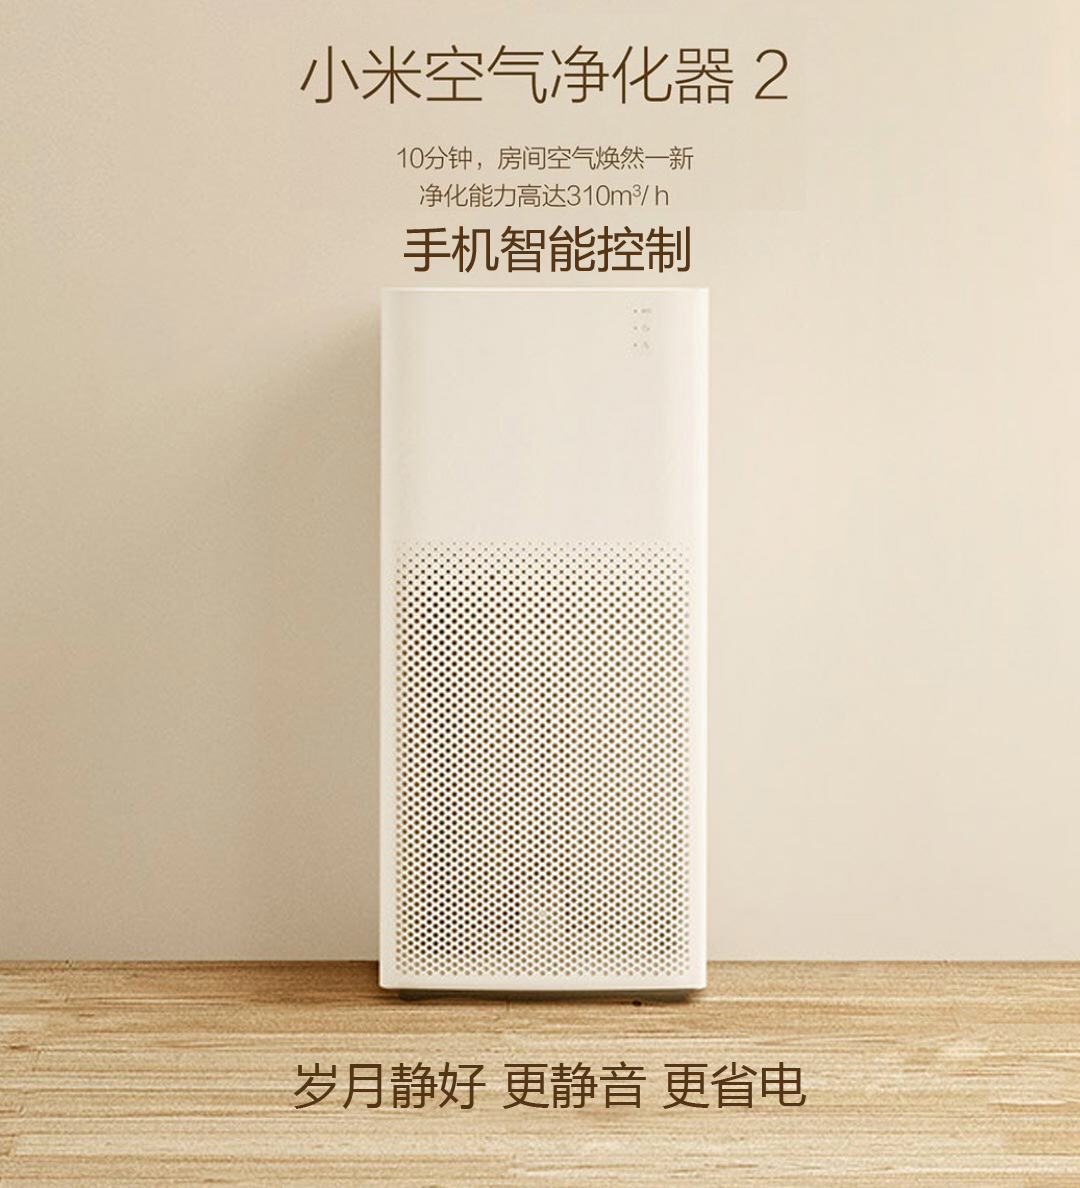 xiaomi小米空气净化器2代大面积除甲醛雾霾PM2.5家用客厅卧室氧吧